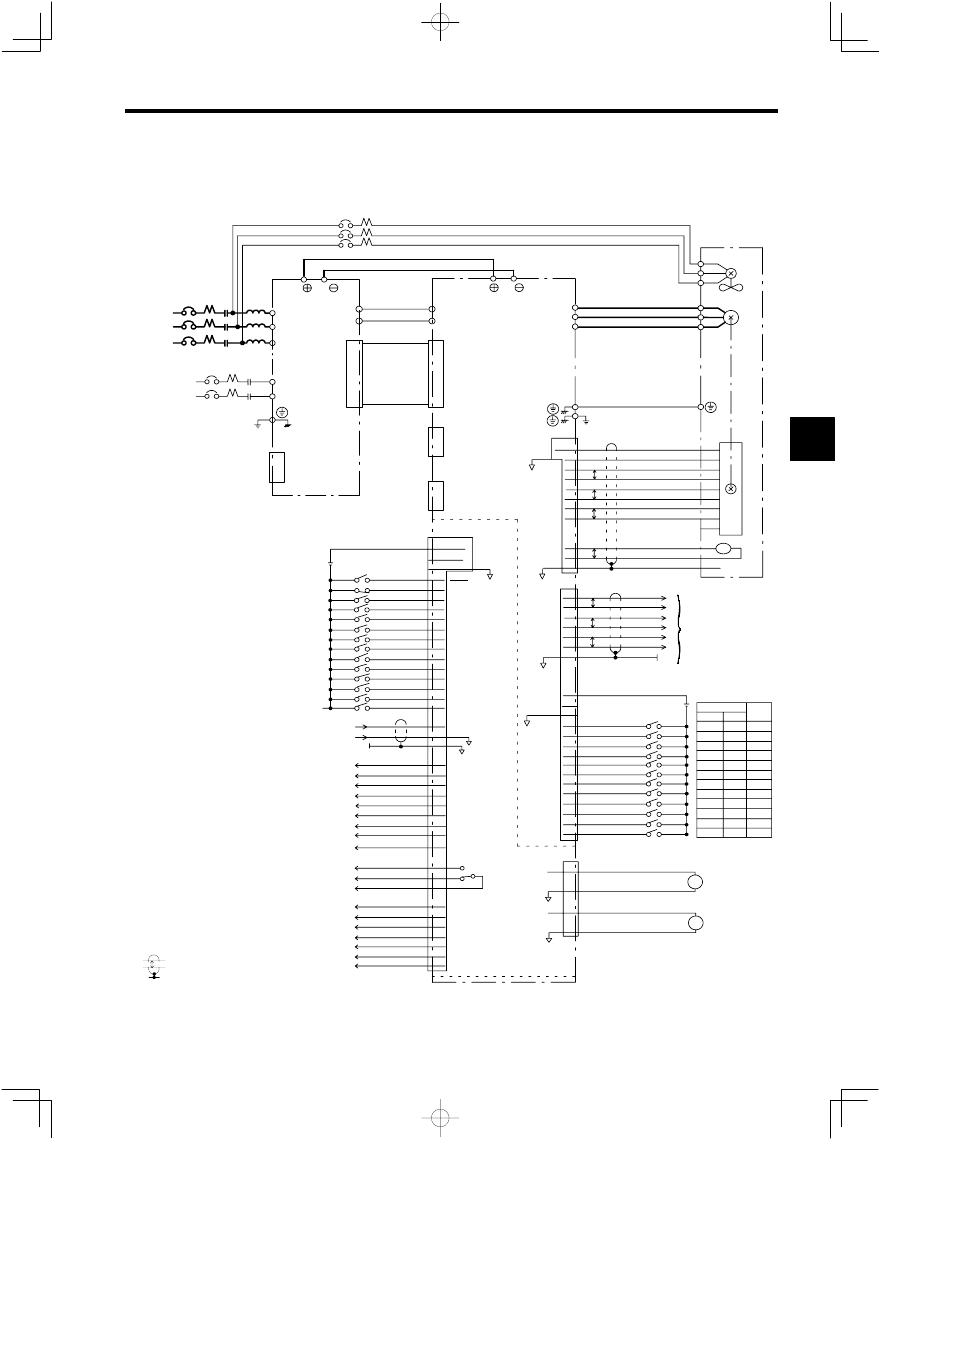 Magnetic Contactor Wiring Diagram Ph Yaskawa on